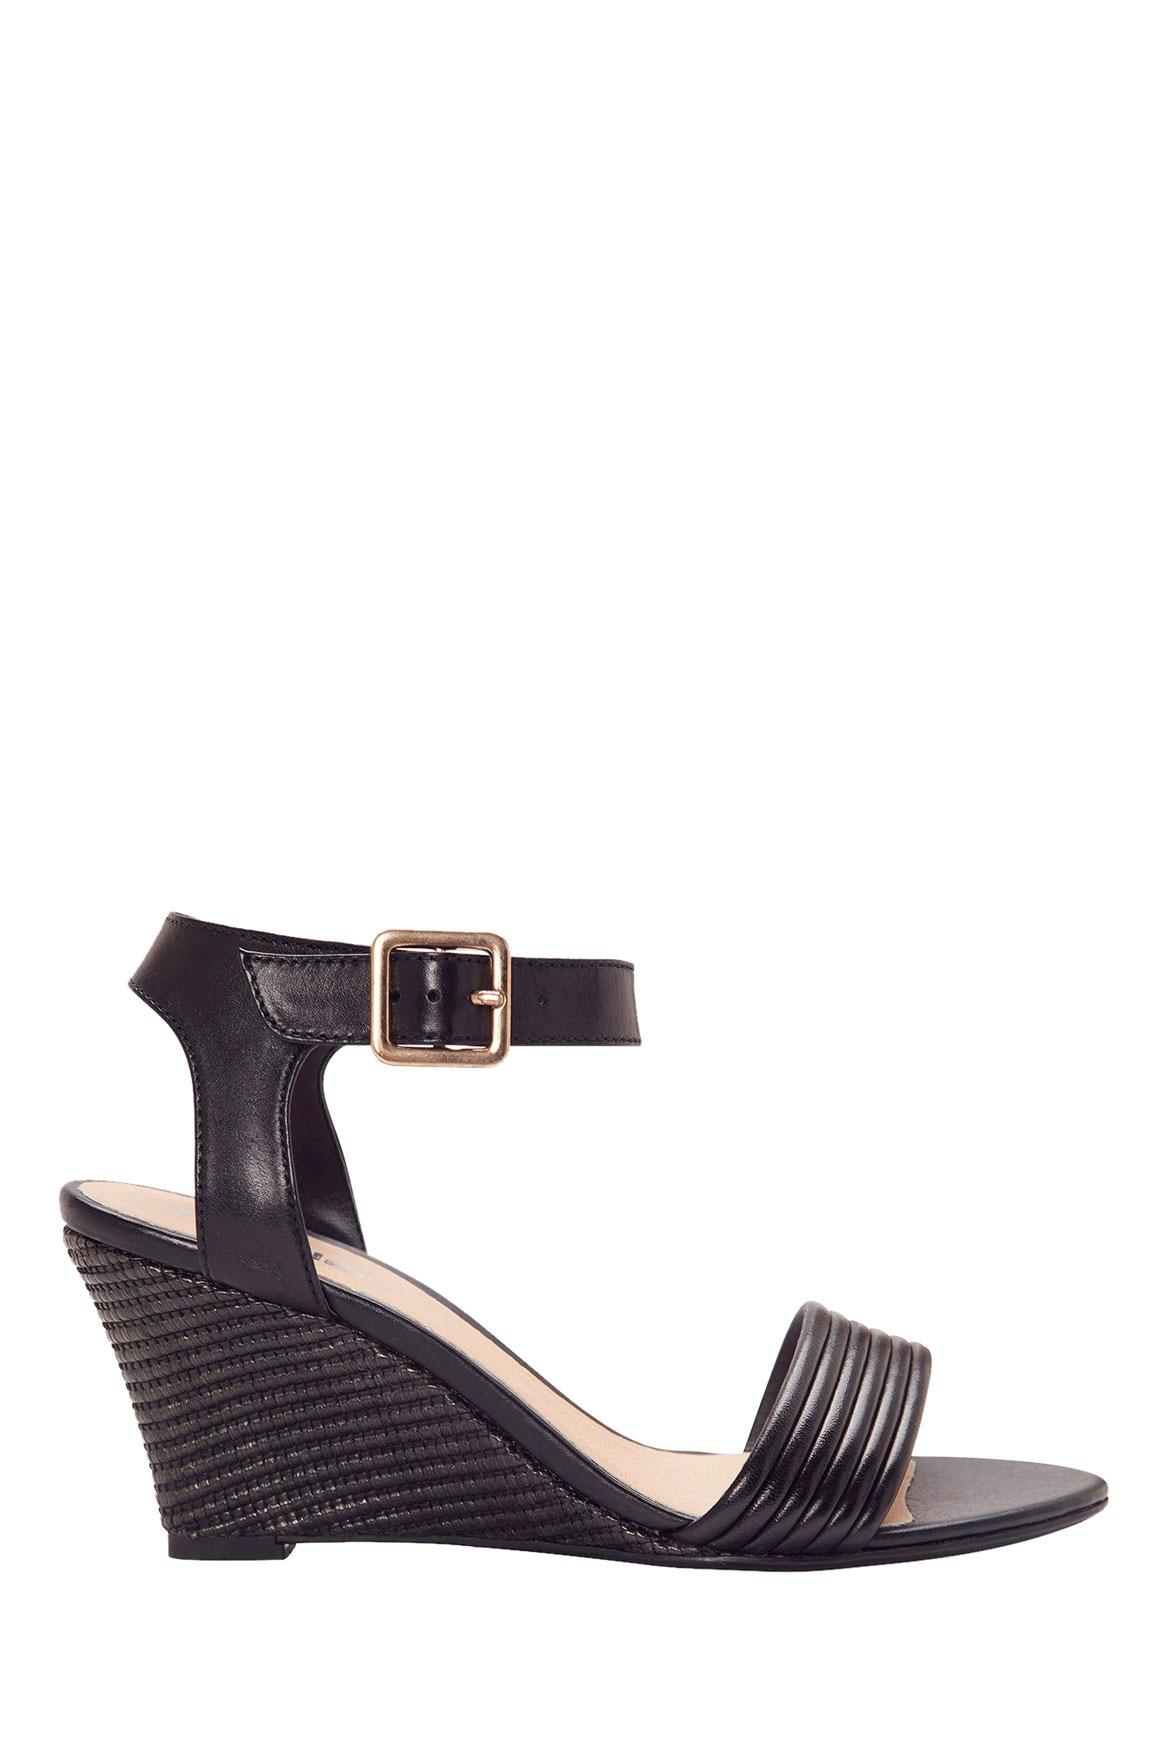 Black sandals myer - Black Sandals Myer 6